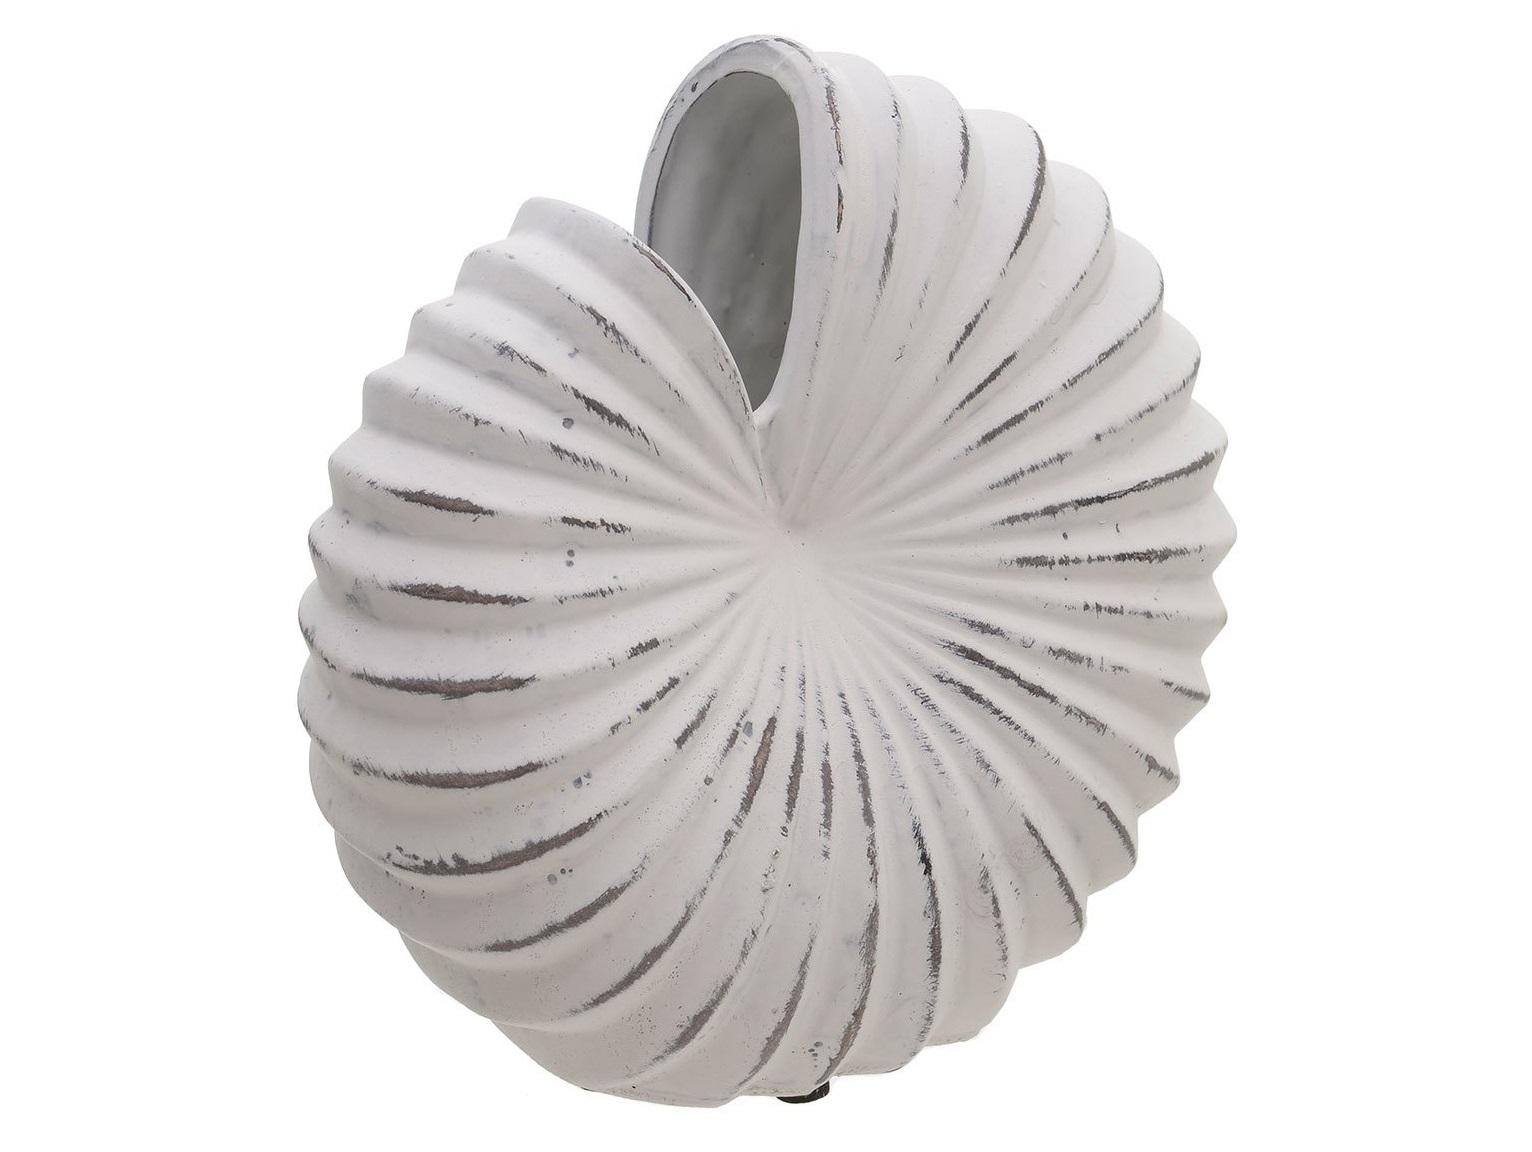 Ваза VuniroВазы<br><br><br>Material: Керамика<br>Ширина см: 22<br>Высота см: 22<br>Глубина см: 11